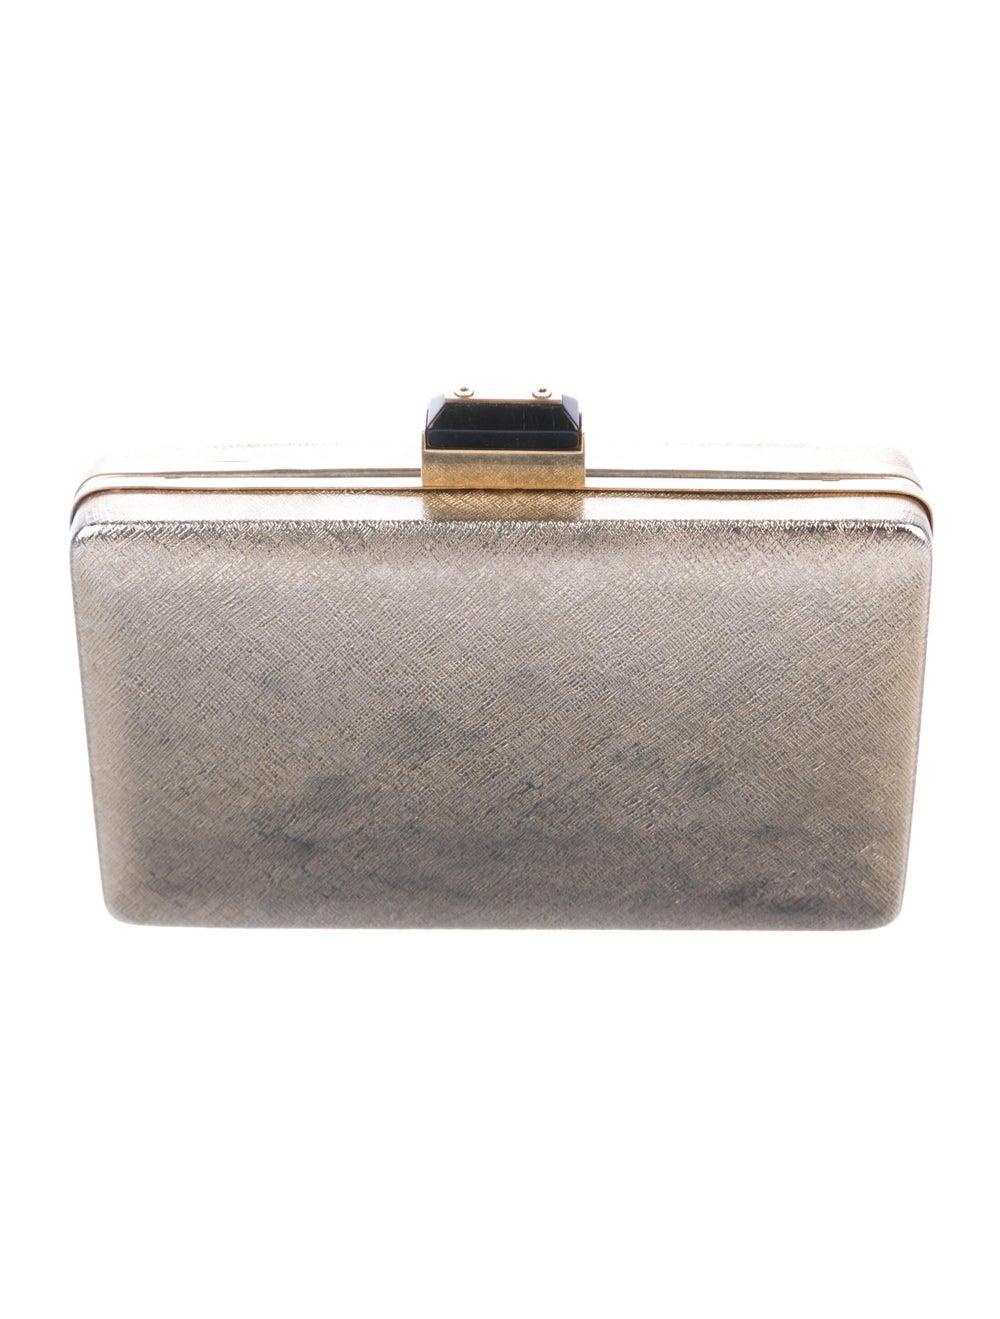 Lanvin Metal Box Clutch Metallic - image 4